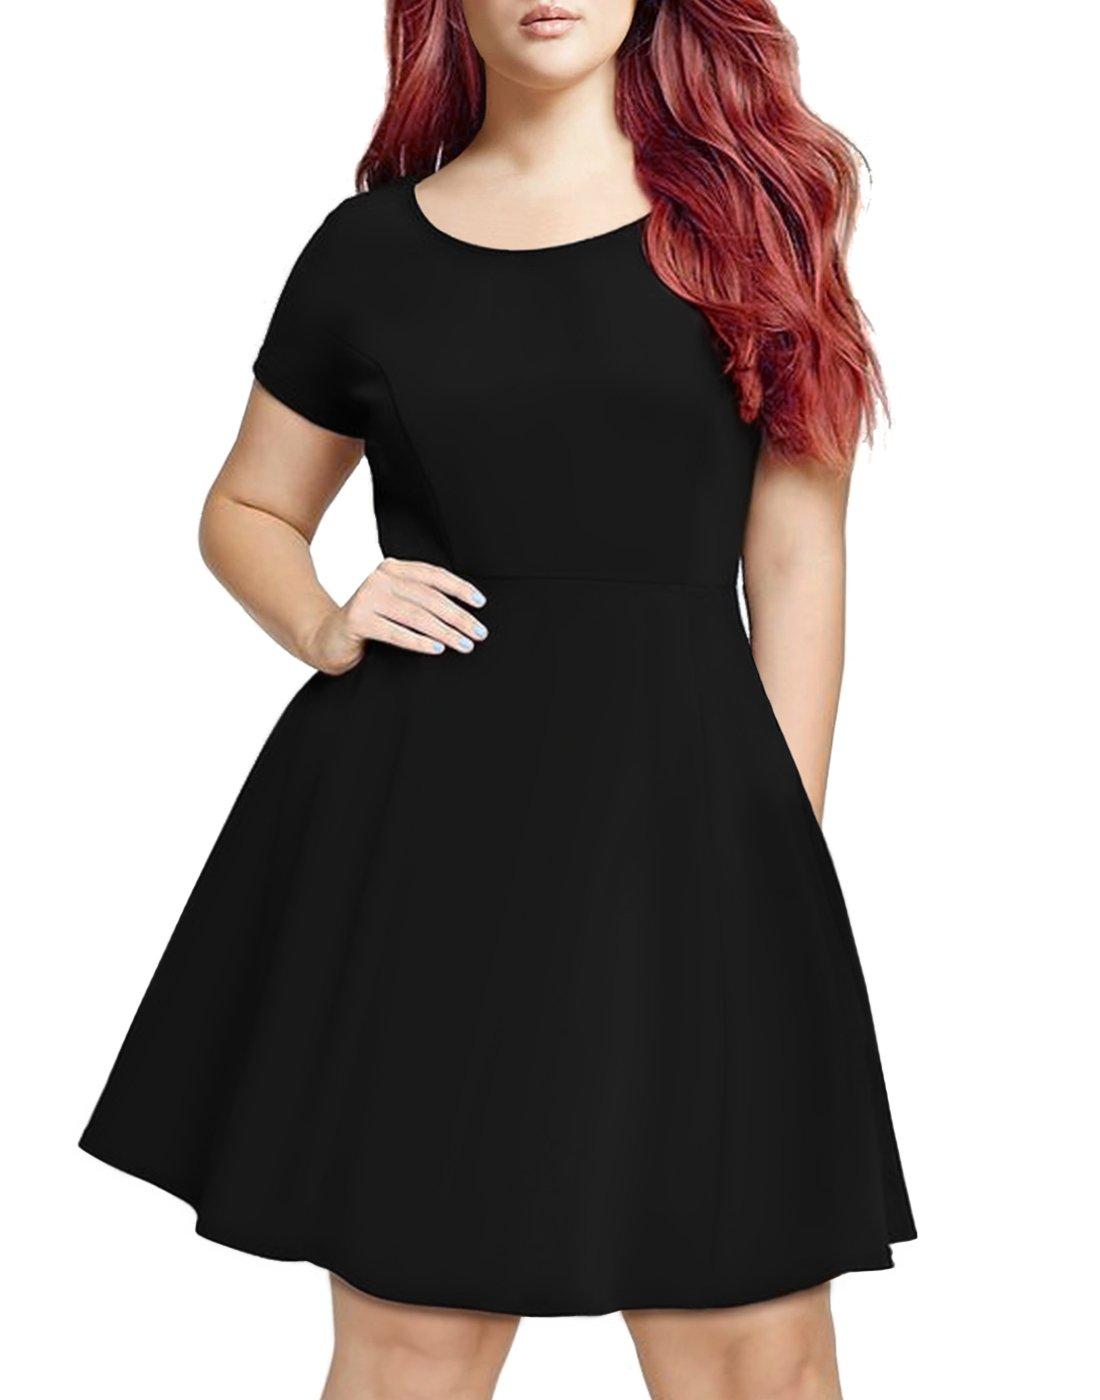 HDE Women's Plus Size Short Sleeve Flared Casual Summer A-Line Midi Dress (Black, 3X)